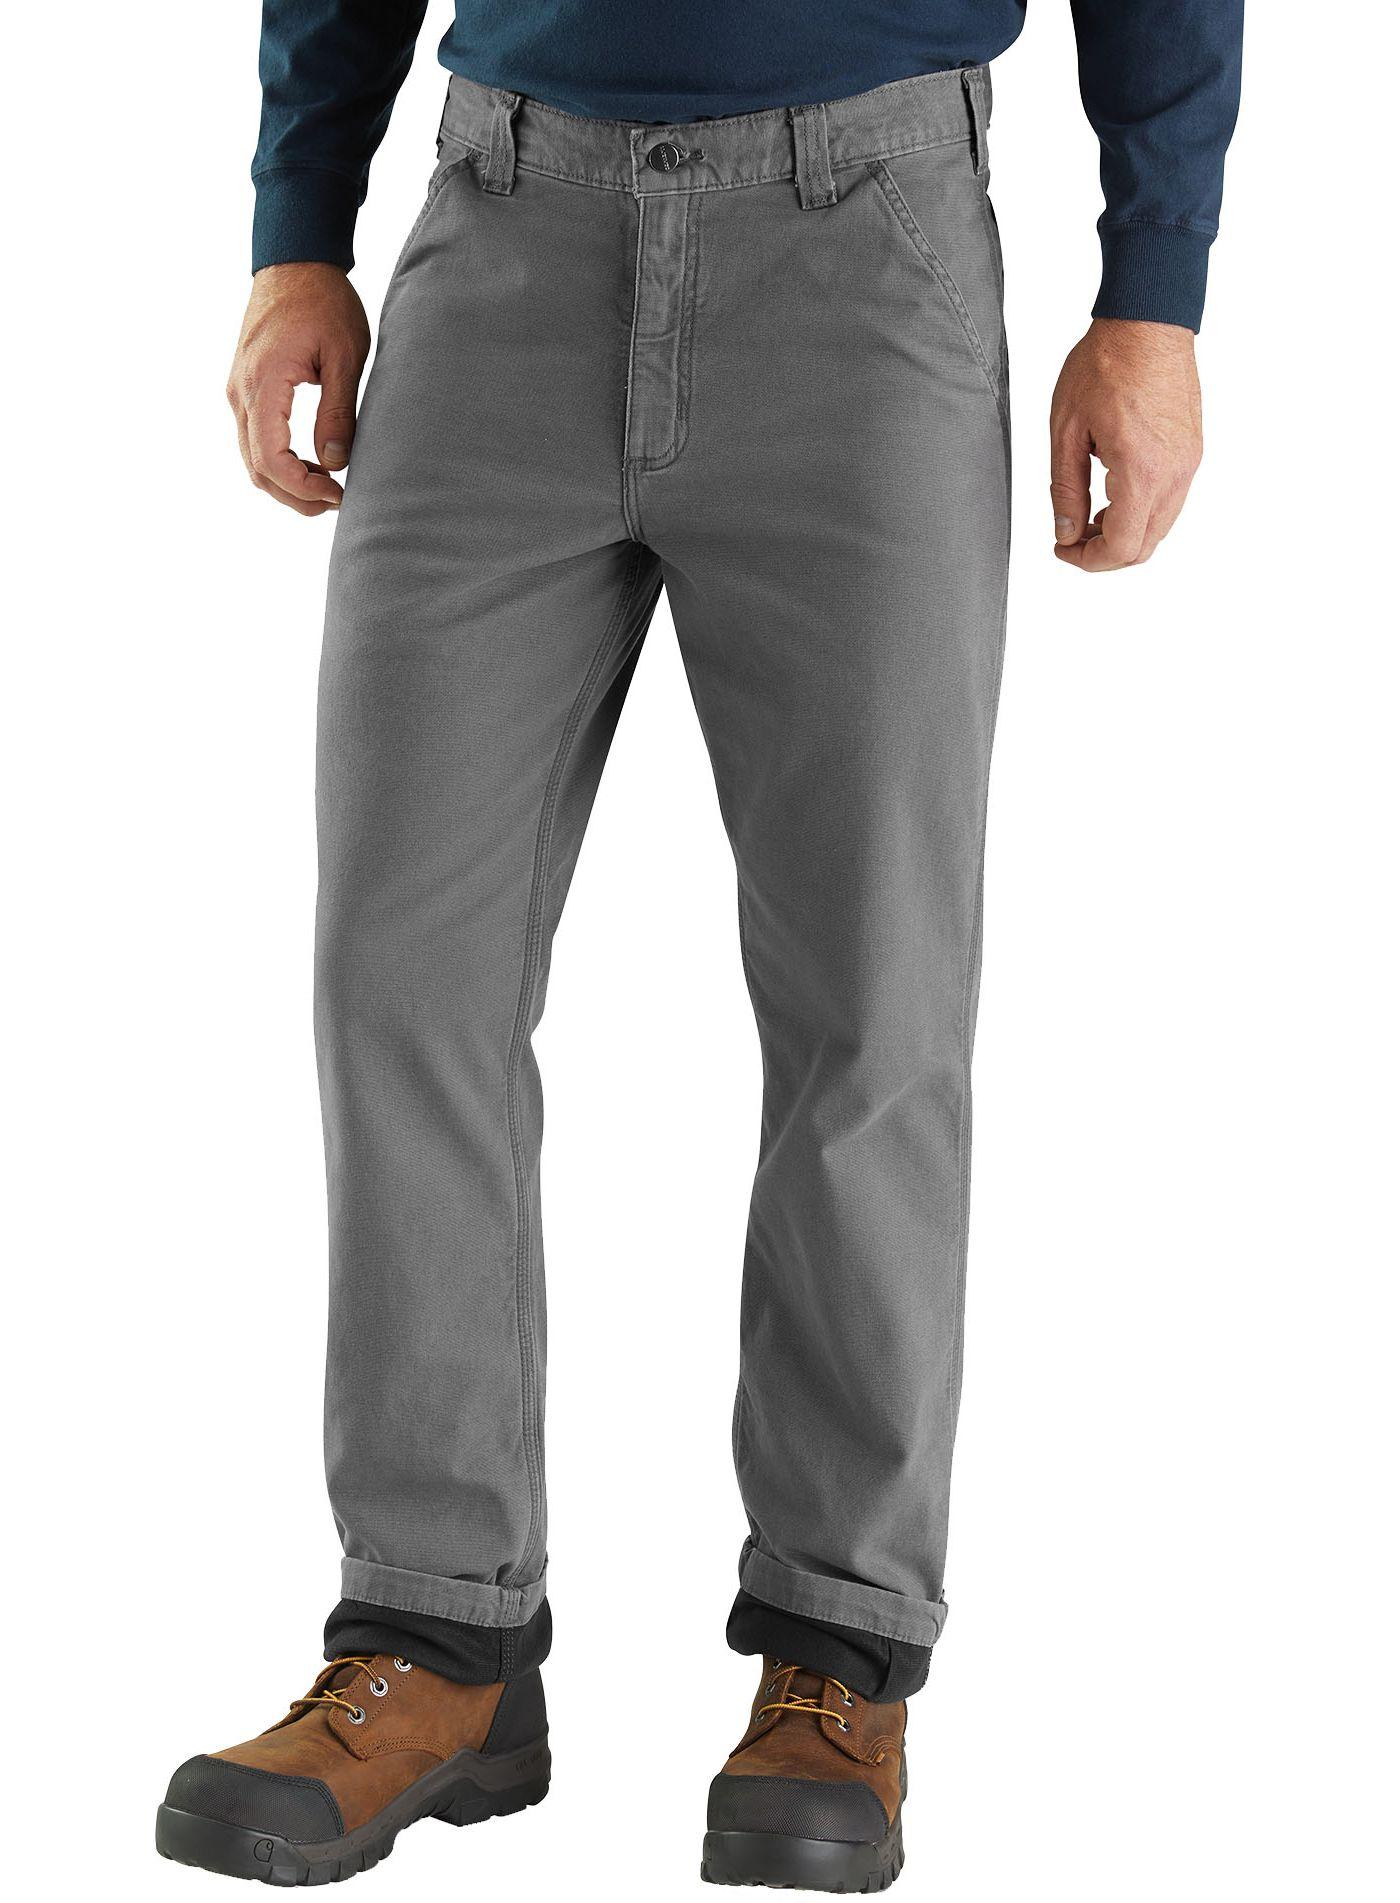 Carhartt Men's Rugged Flex Rigby Flannel Dungarees (Regular and Big & Tall)